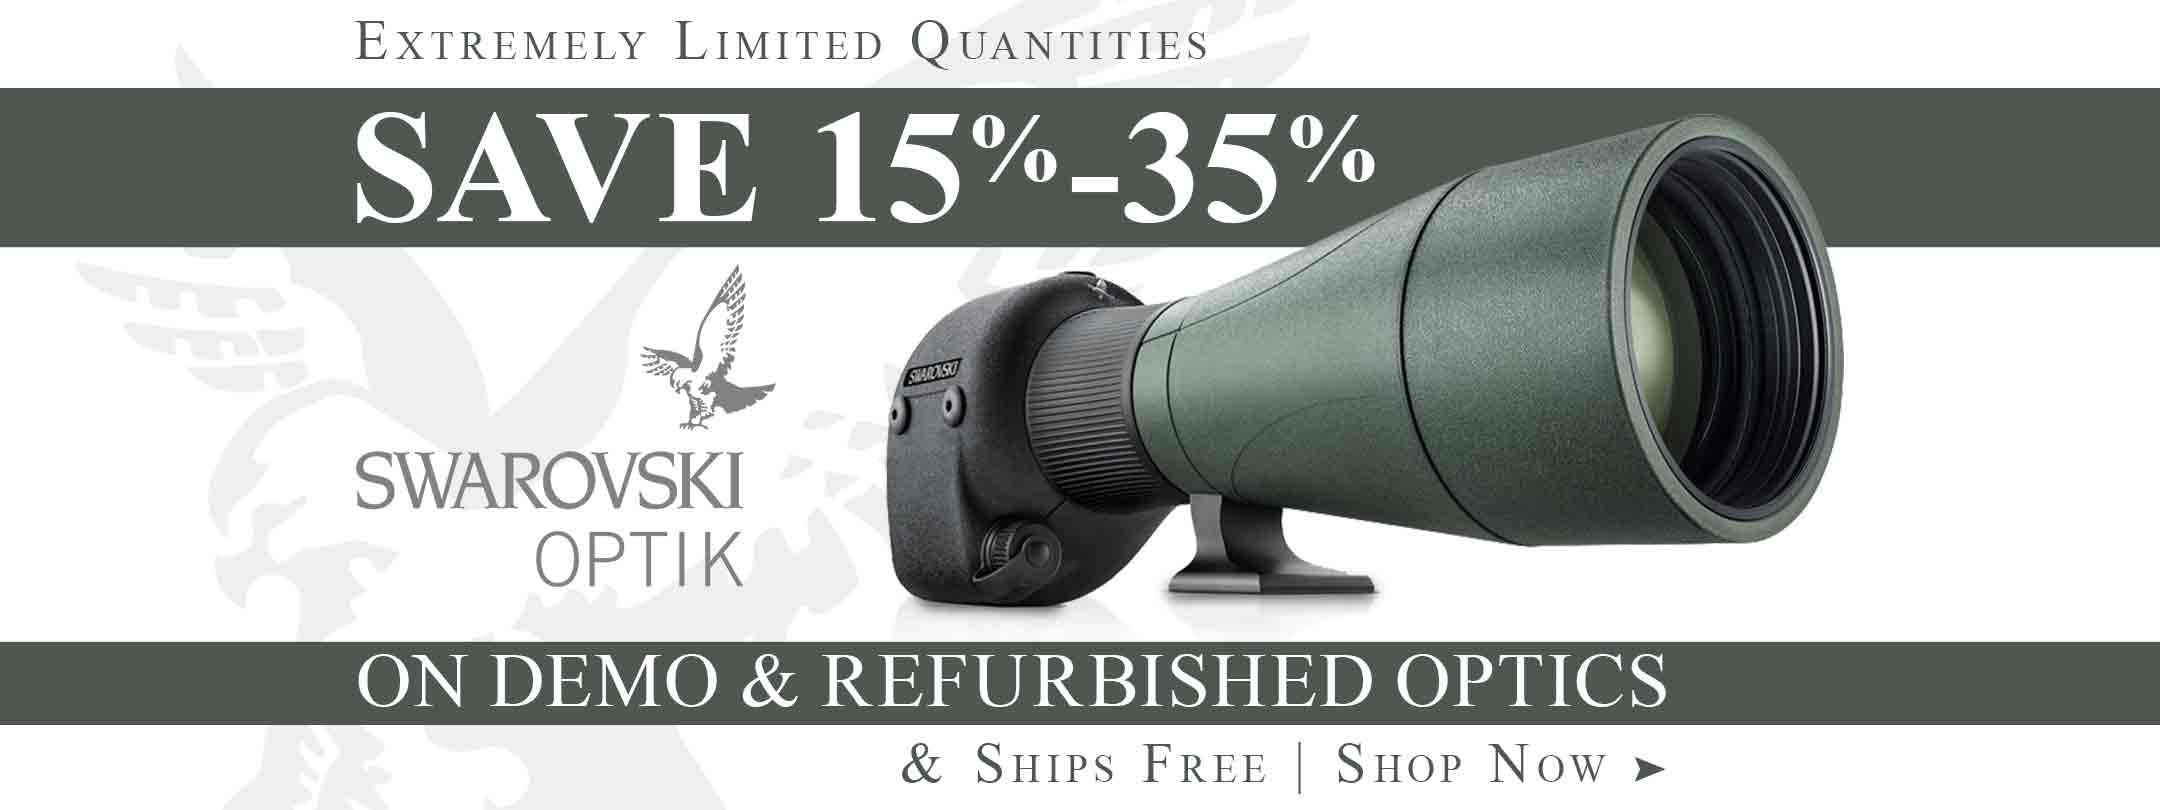 Save on Swarovski Demo & Refurbished Rifle Scopes, Rangefinders & More!